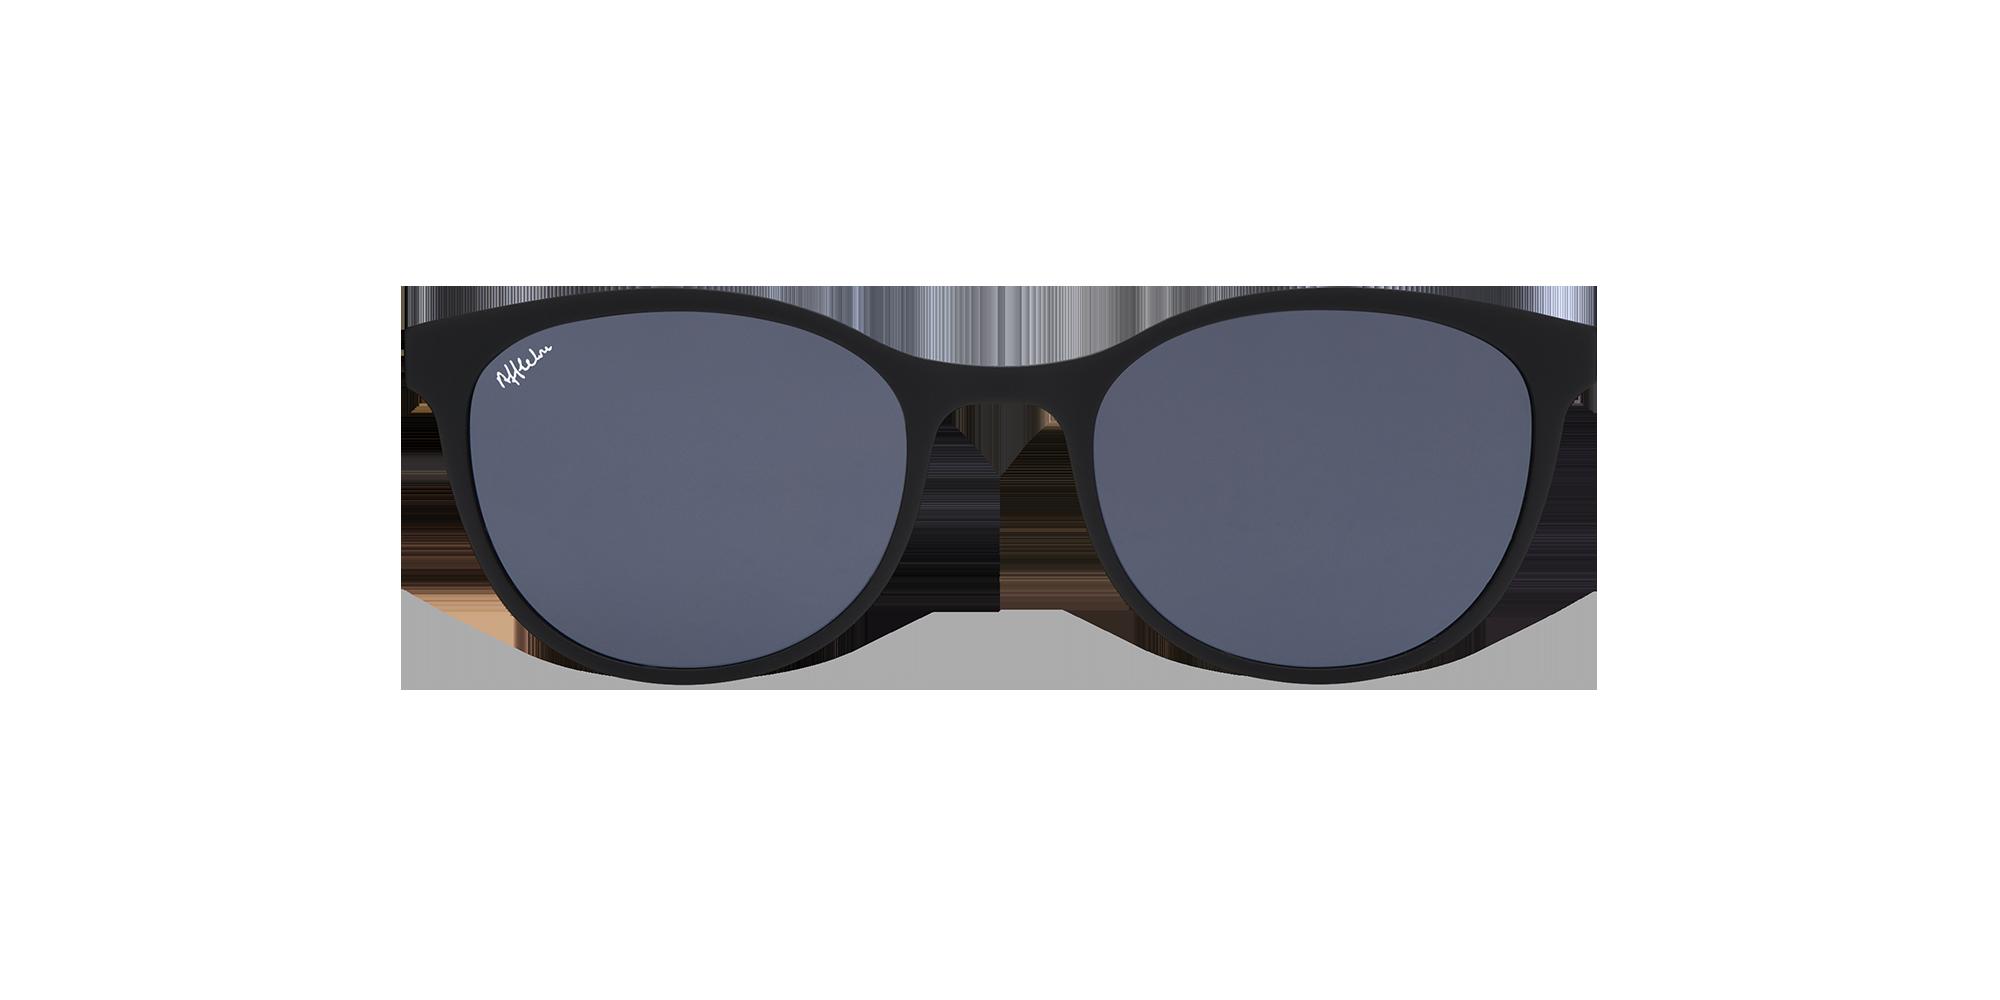 afflelou/france/products/smart_clip/clips_glasses/TMK45SUBK014818.png